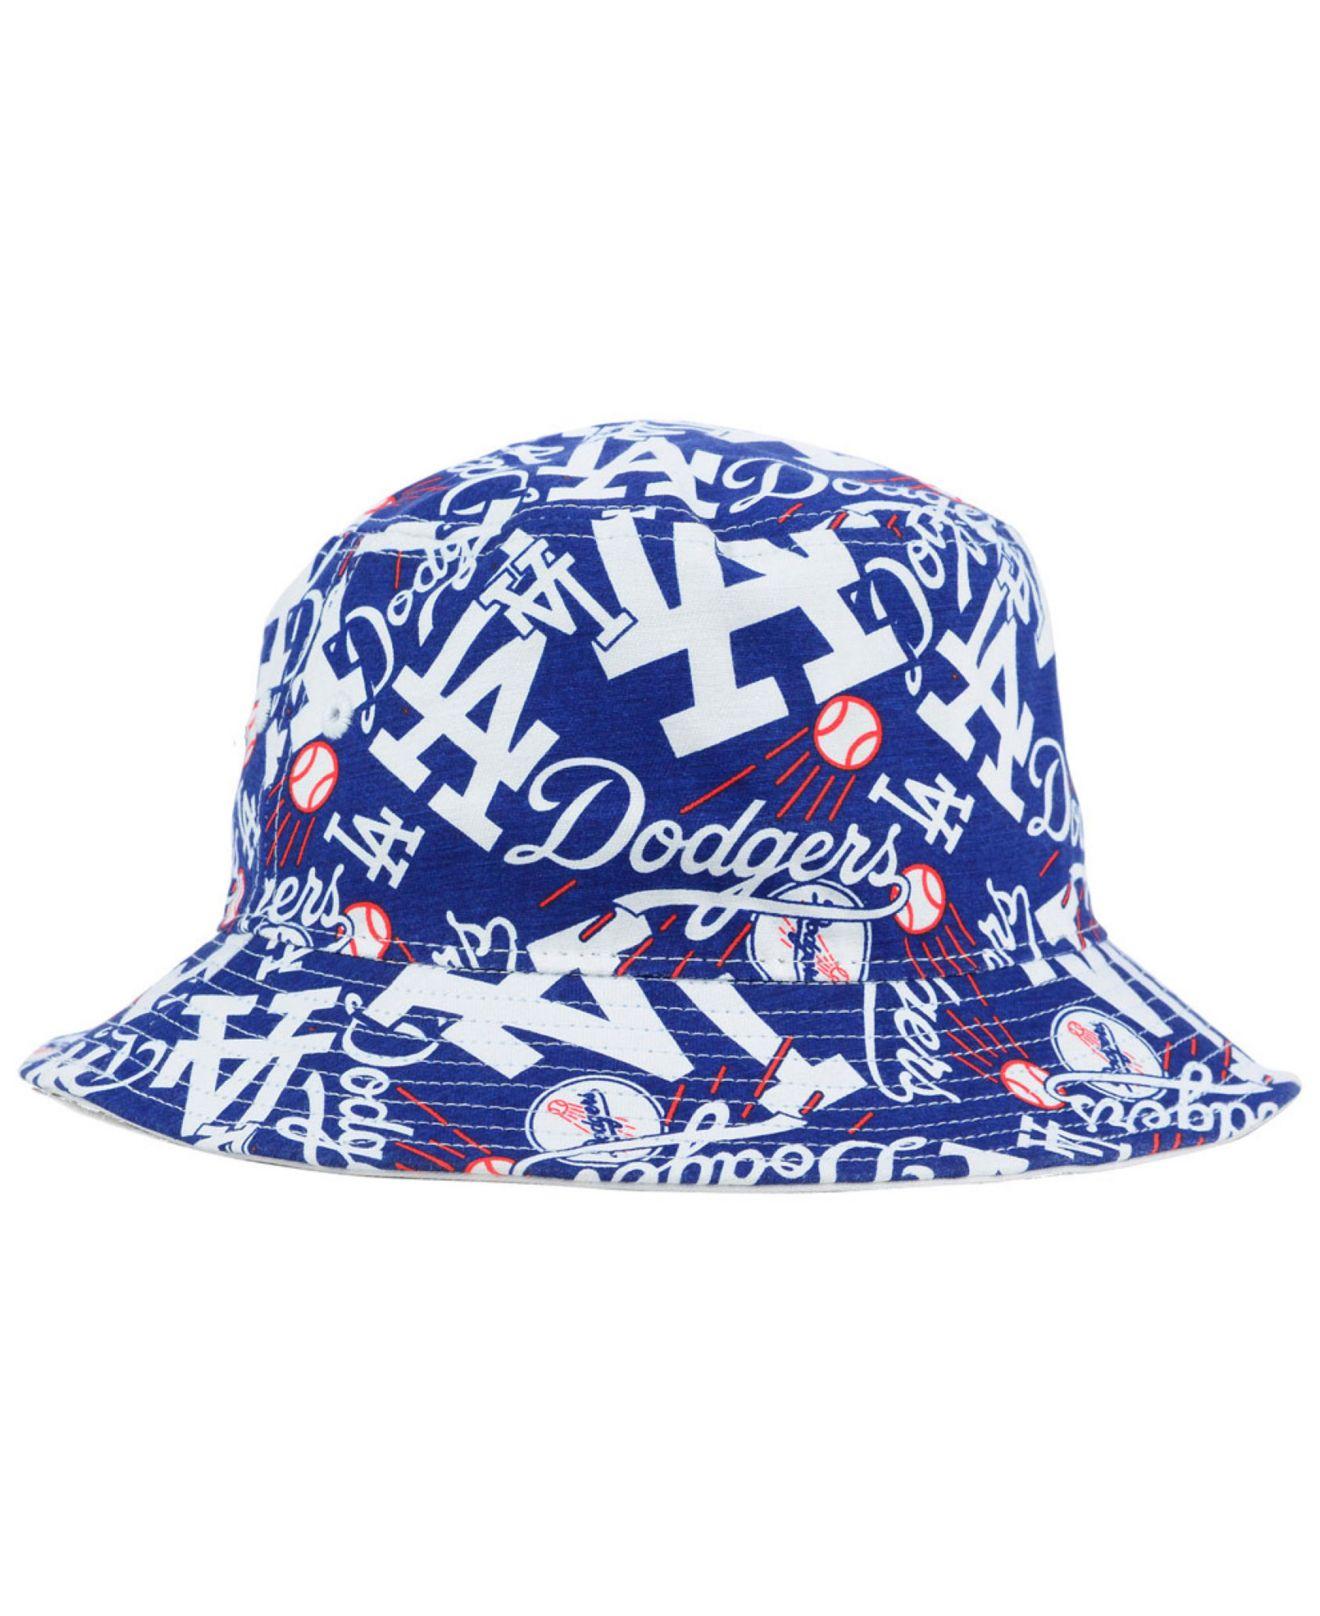 size 40 a7f24 0b32d Lyst - 47 Brand Los Angeles Dodgers Bravado Bucket Hat in Blue for Men